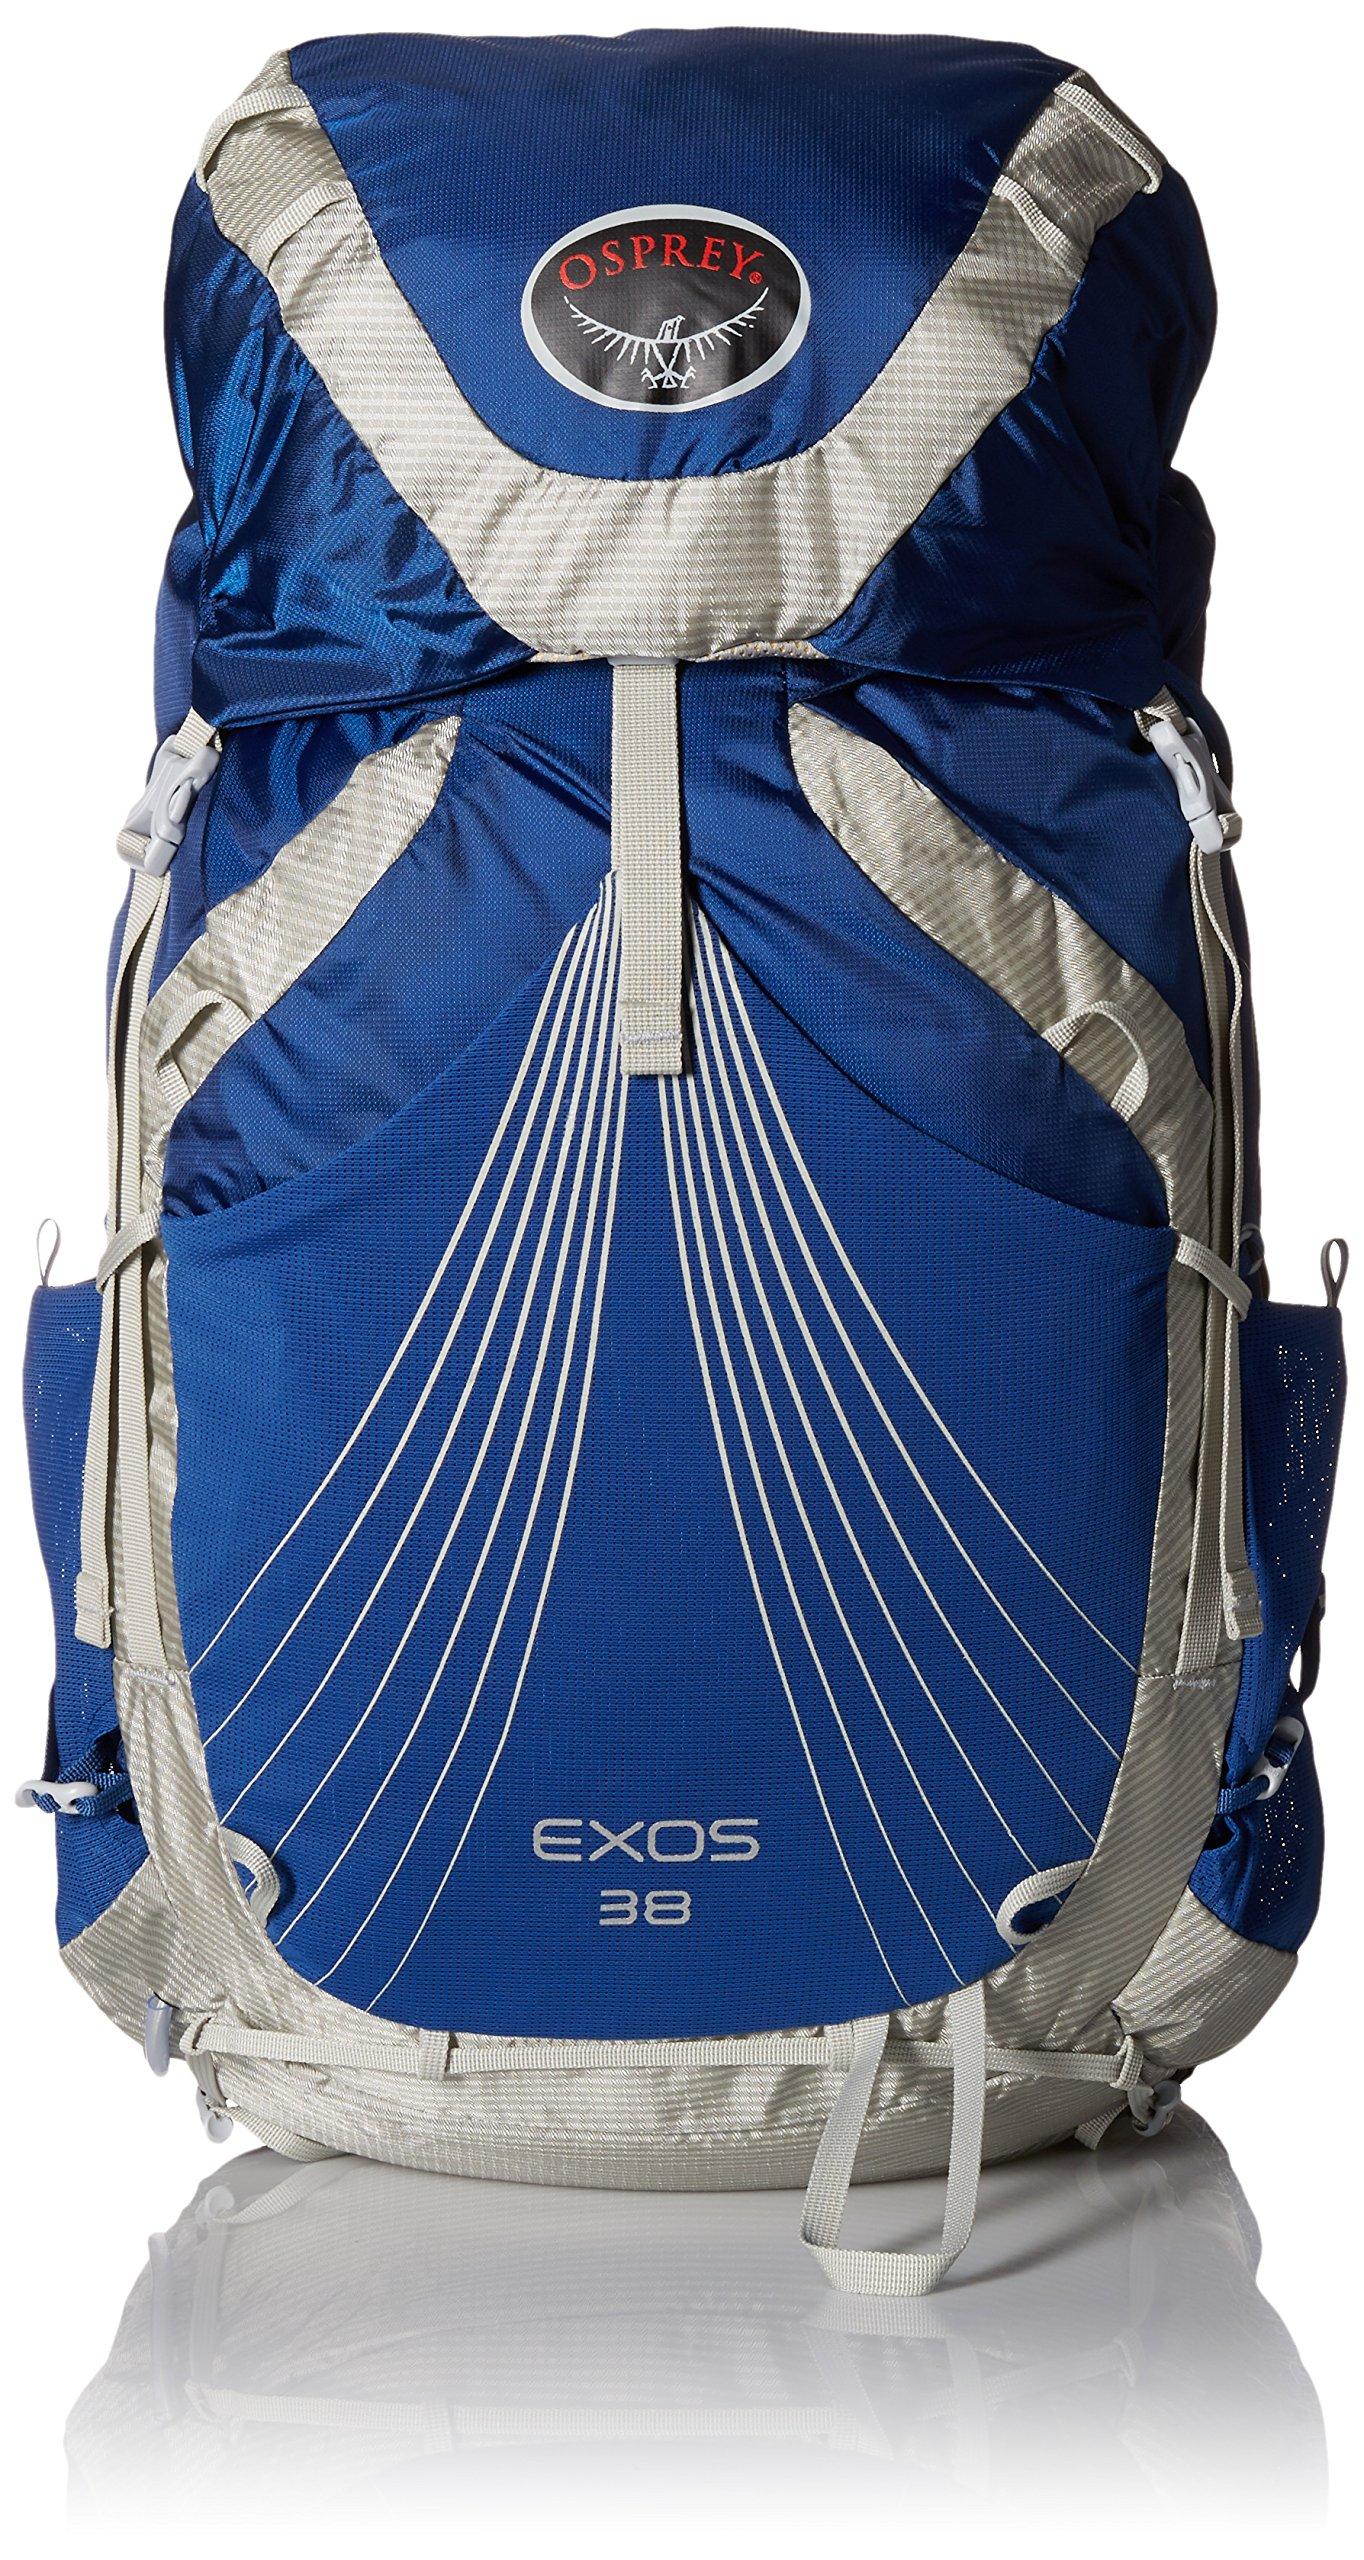 Osprey Packs Exos 38 Backpack, Pacific Blue, Medium